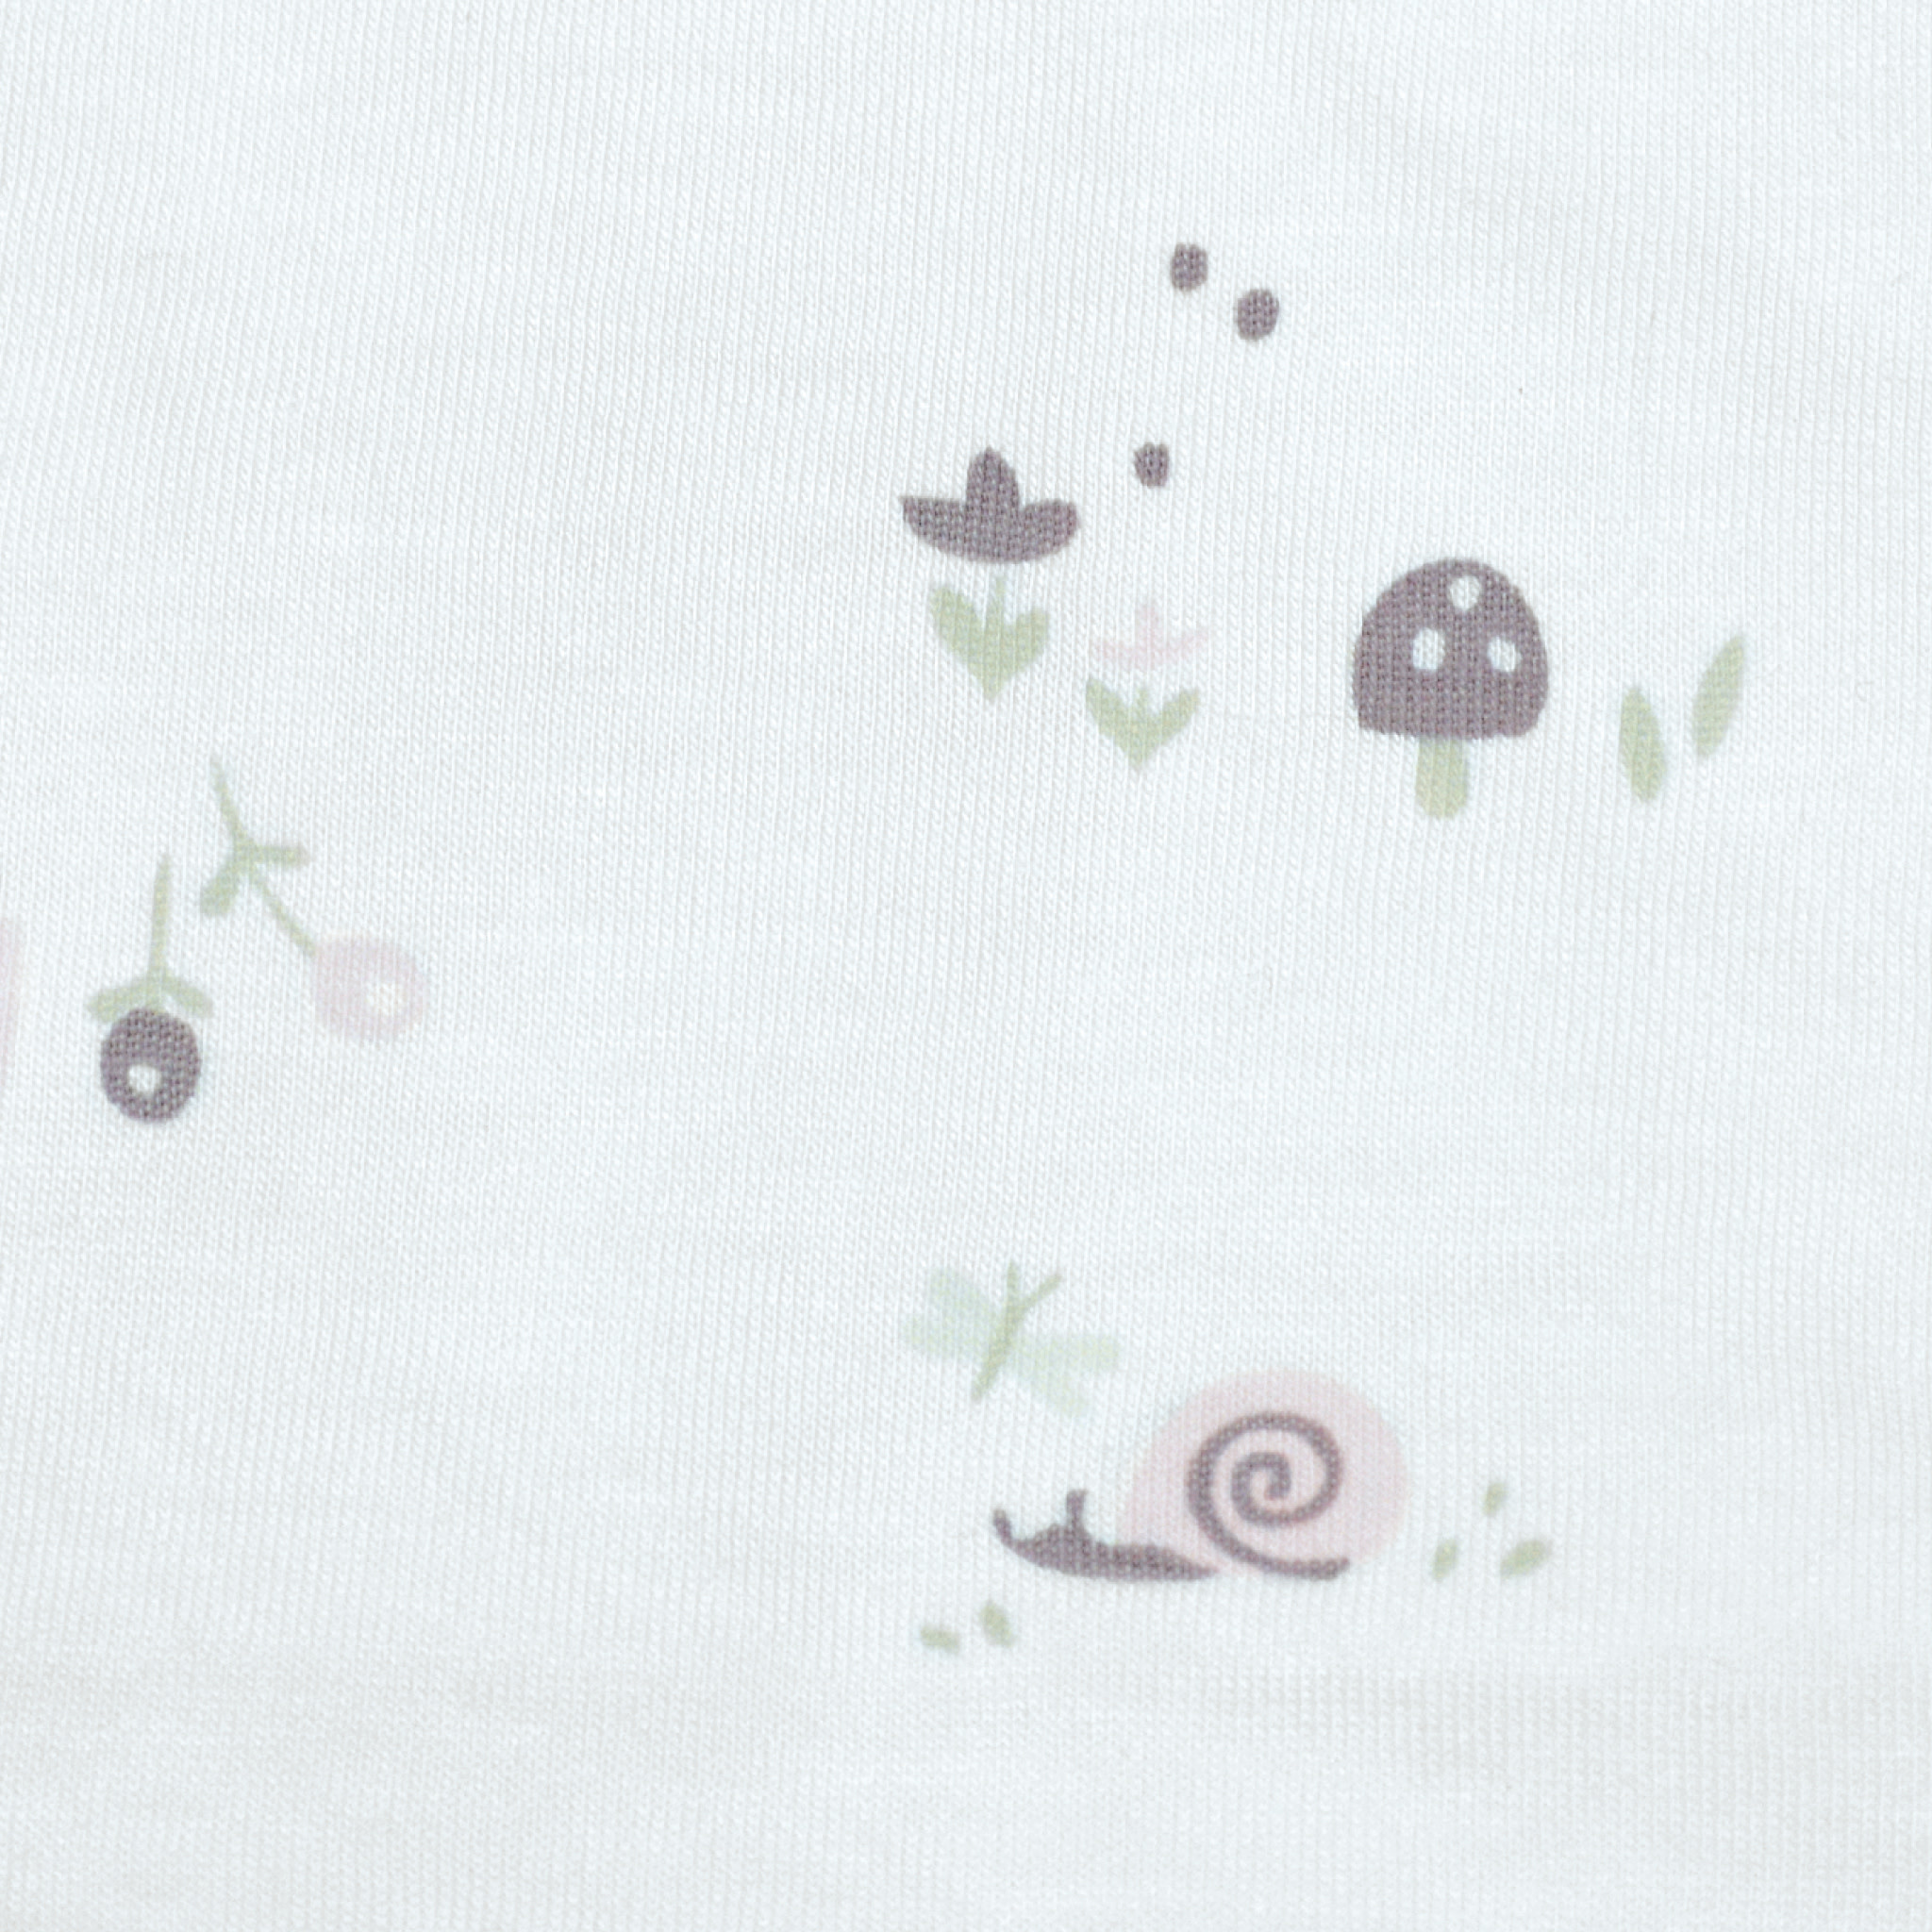 Bamboo Sleep Sack - 1 Tog - Mushrooms & Snails